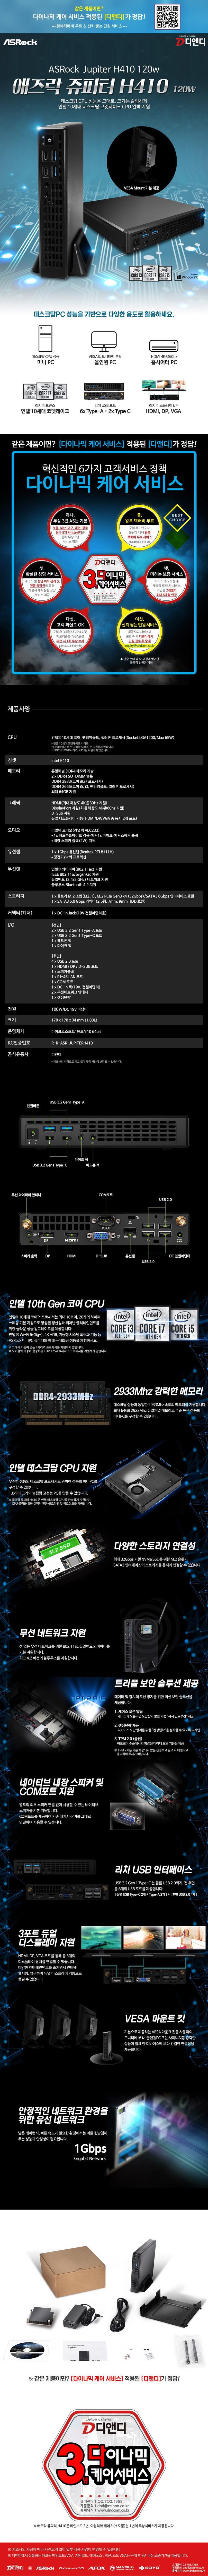 ASRock Jupiter H410 i3-10100 120W 디앤디컴 (4GB, M2 128GB)